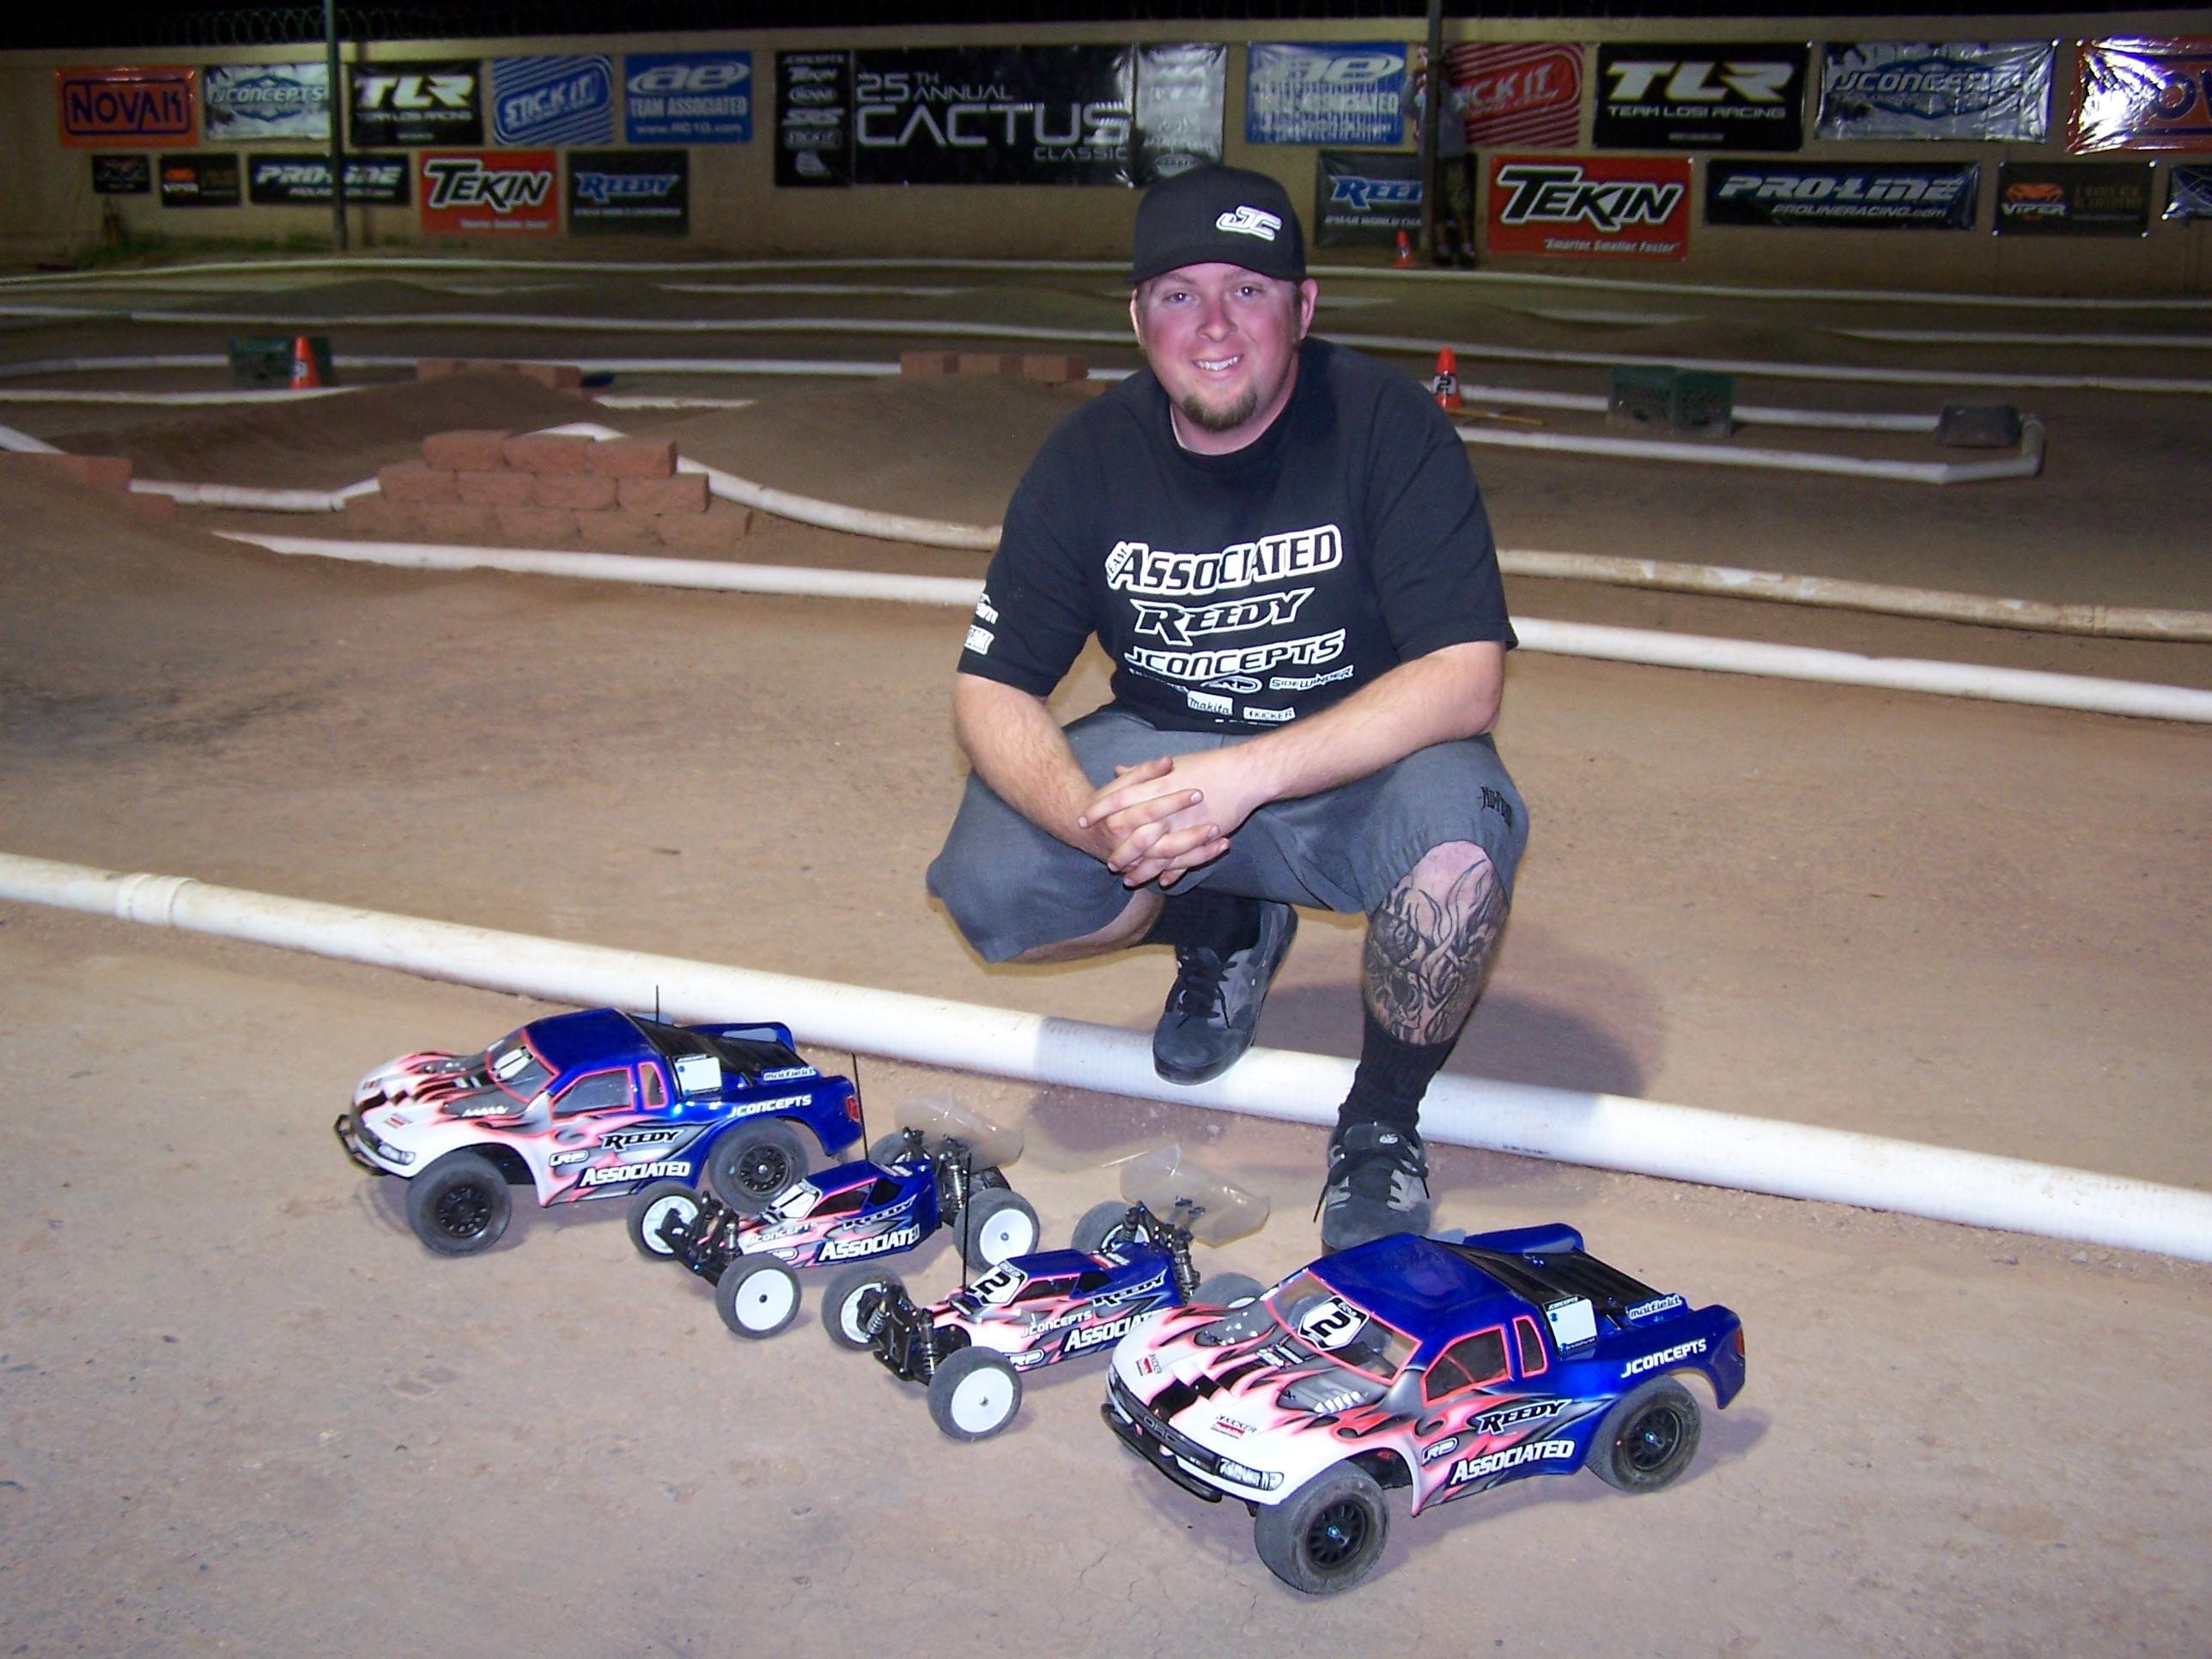 Ryan Maifield Dominates 2011 Cactus Classic